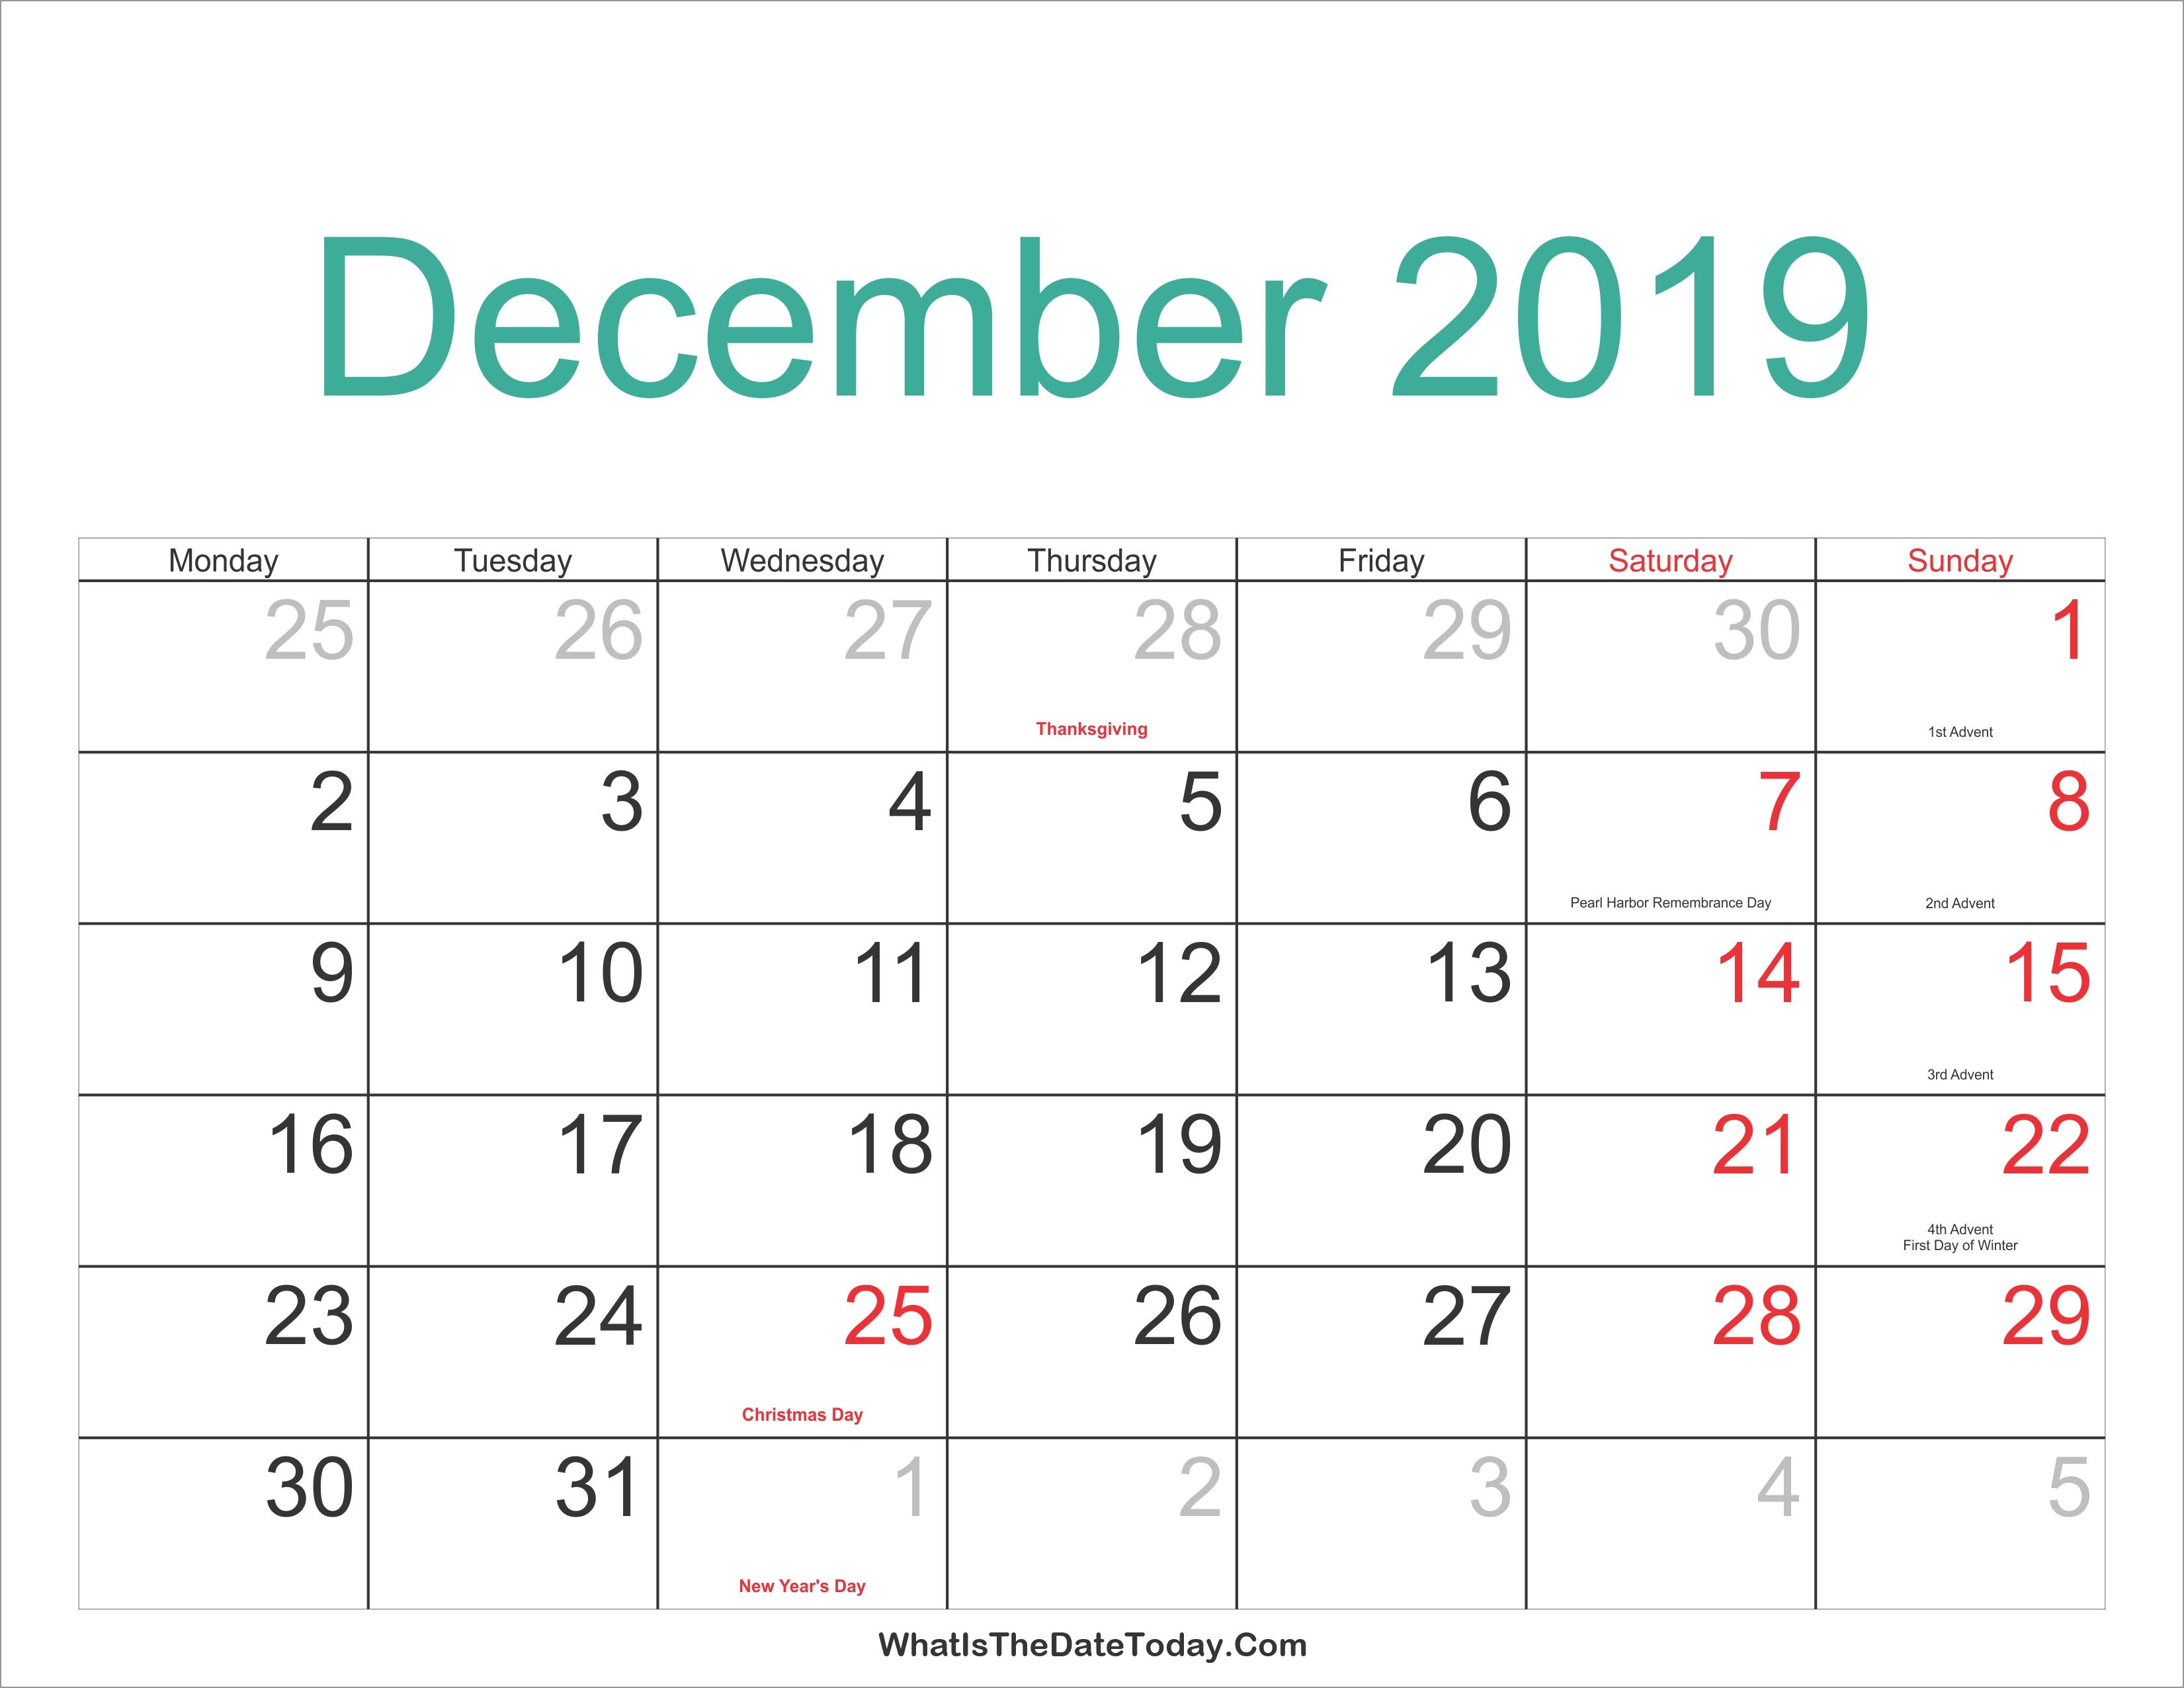 December 2019 Calendar With Holidays Printabe   Calendar Pdf Png